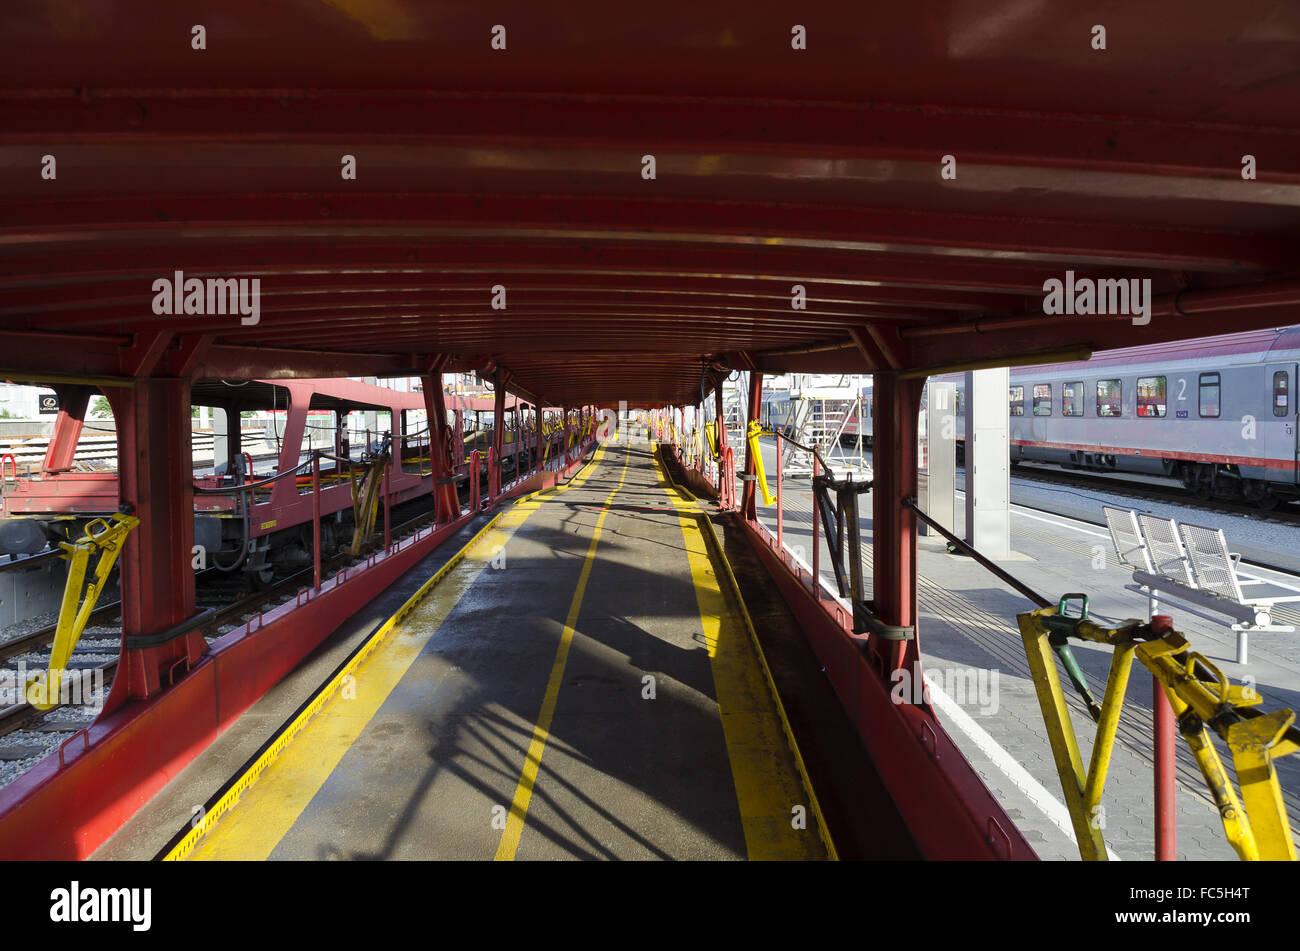 row of empty car train waggons - Stock Image